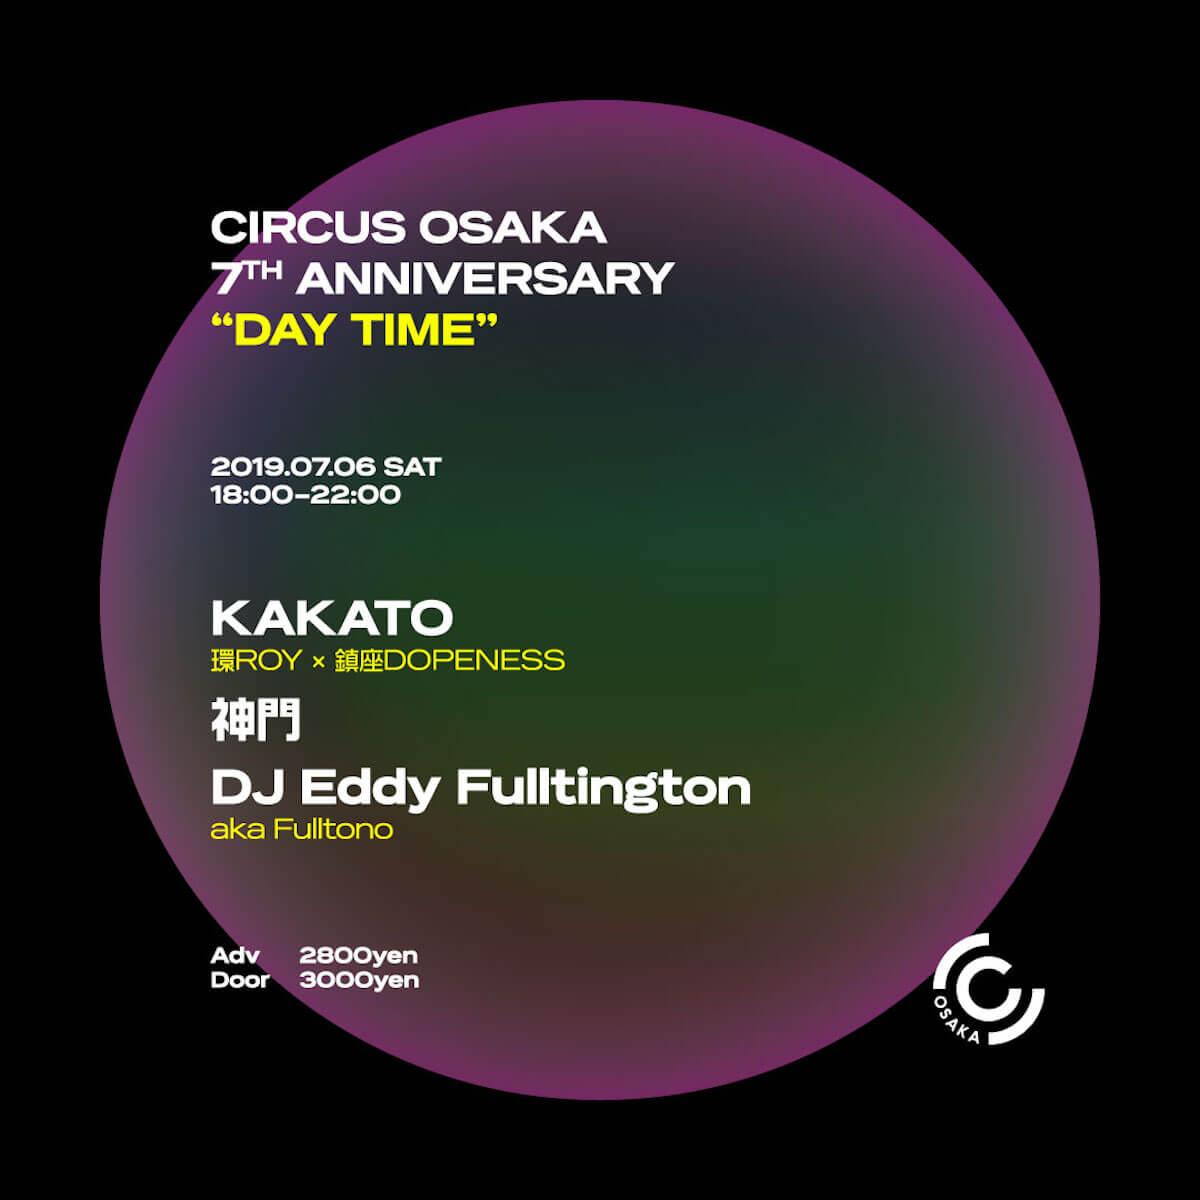 CIRCUS OSAKAが7周年!2日間に渡るアニバーサリーパーティーを開催 KAKATO、okadada、DJ FULLTONOらがラインナップに 2019-07-05_06_CIRCUS-Osaka-7th-ANNIVESARY-01-02A